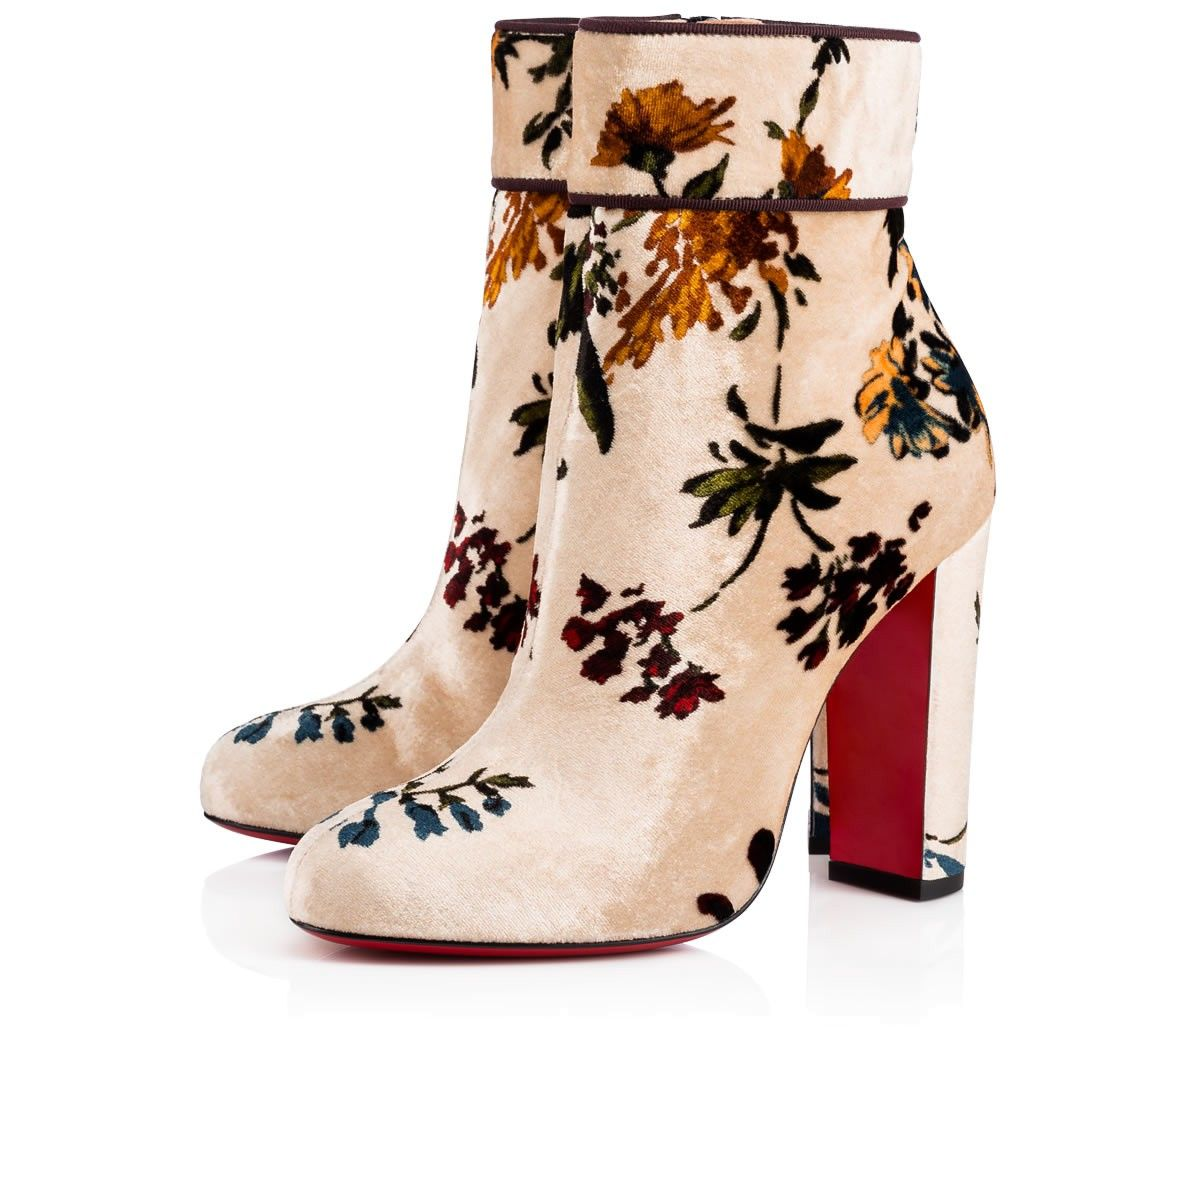 ada8b4369a2 CHRISTIAN LOUBOUTIN Moulamax 100 Nude/Multi Velvet - Women Shoes ...